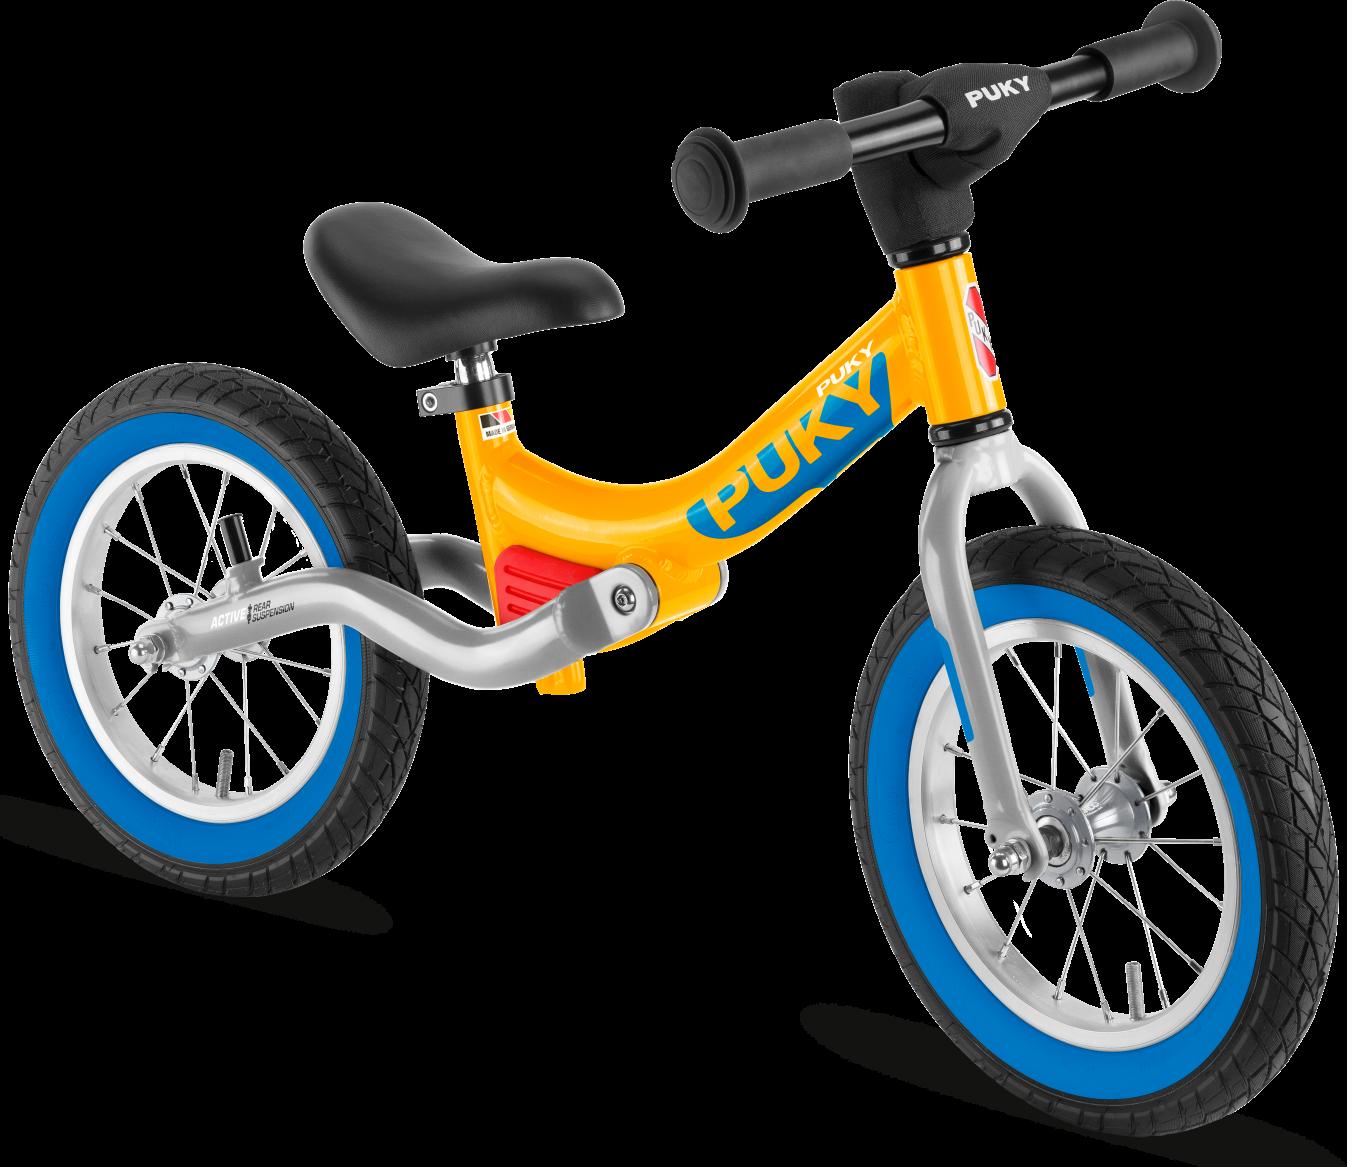 Puky LR RIDE SPLASH Løbecykel - Gul